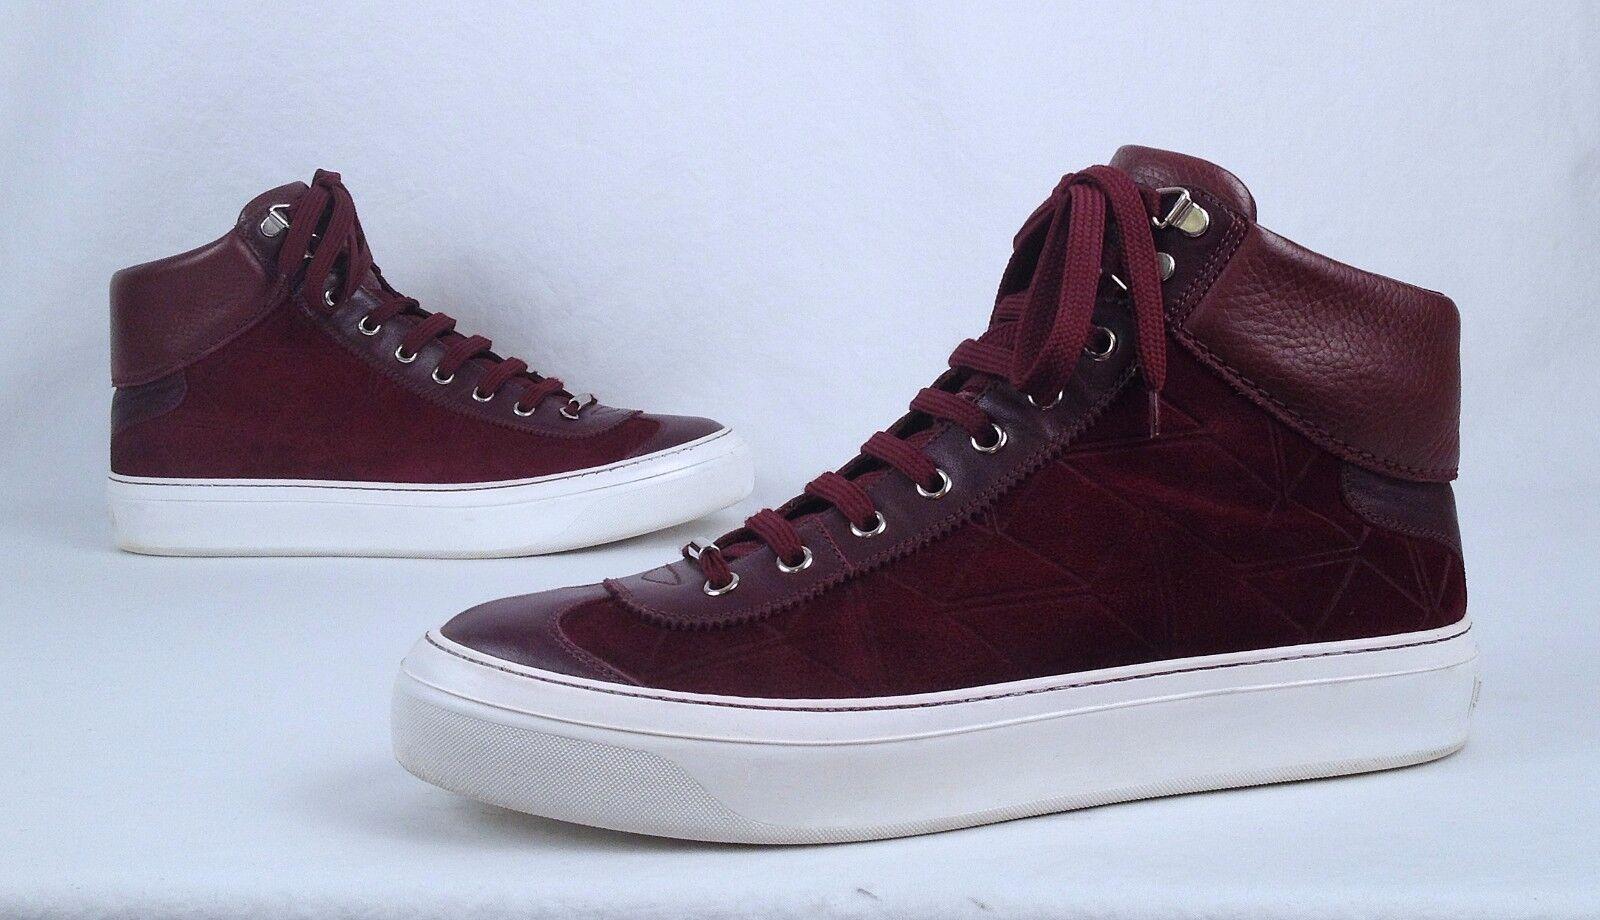 Jimmy Choo Hi-Top Sneaker- Maroon- 9 US  42 EU  (MB3)